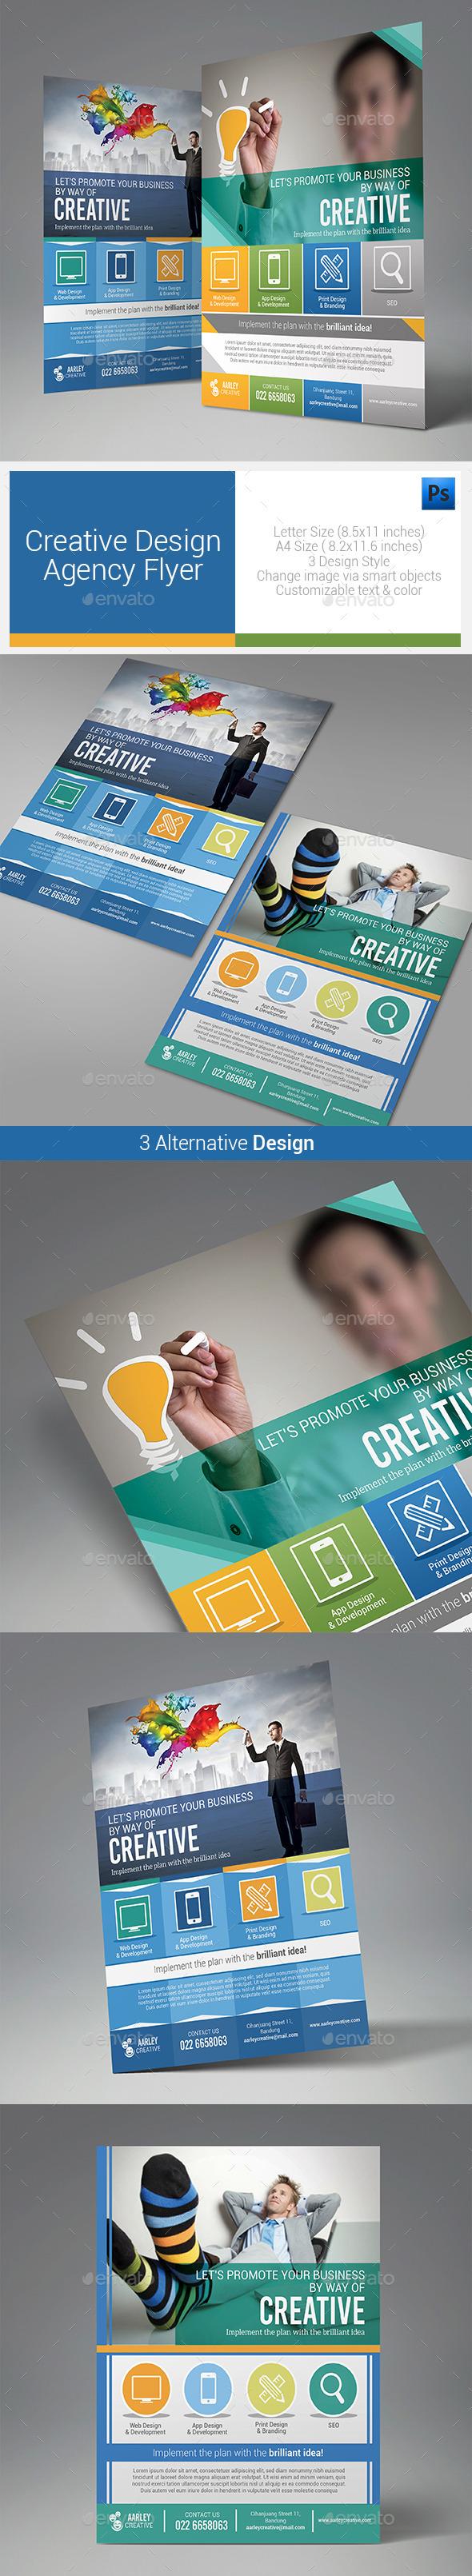 Creative Design Agency Flyers - Corporate Flyers